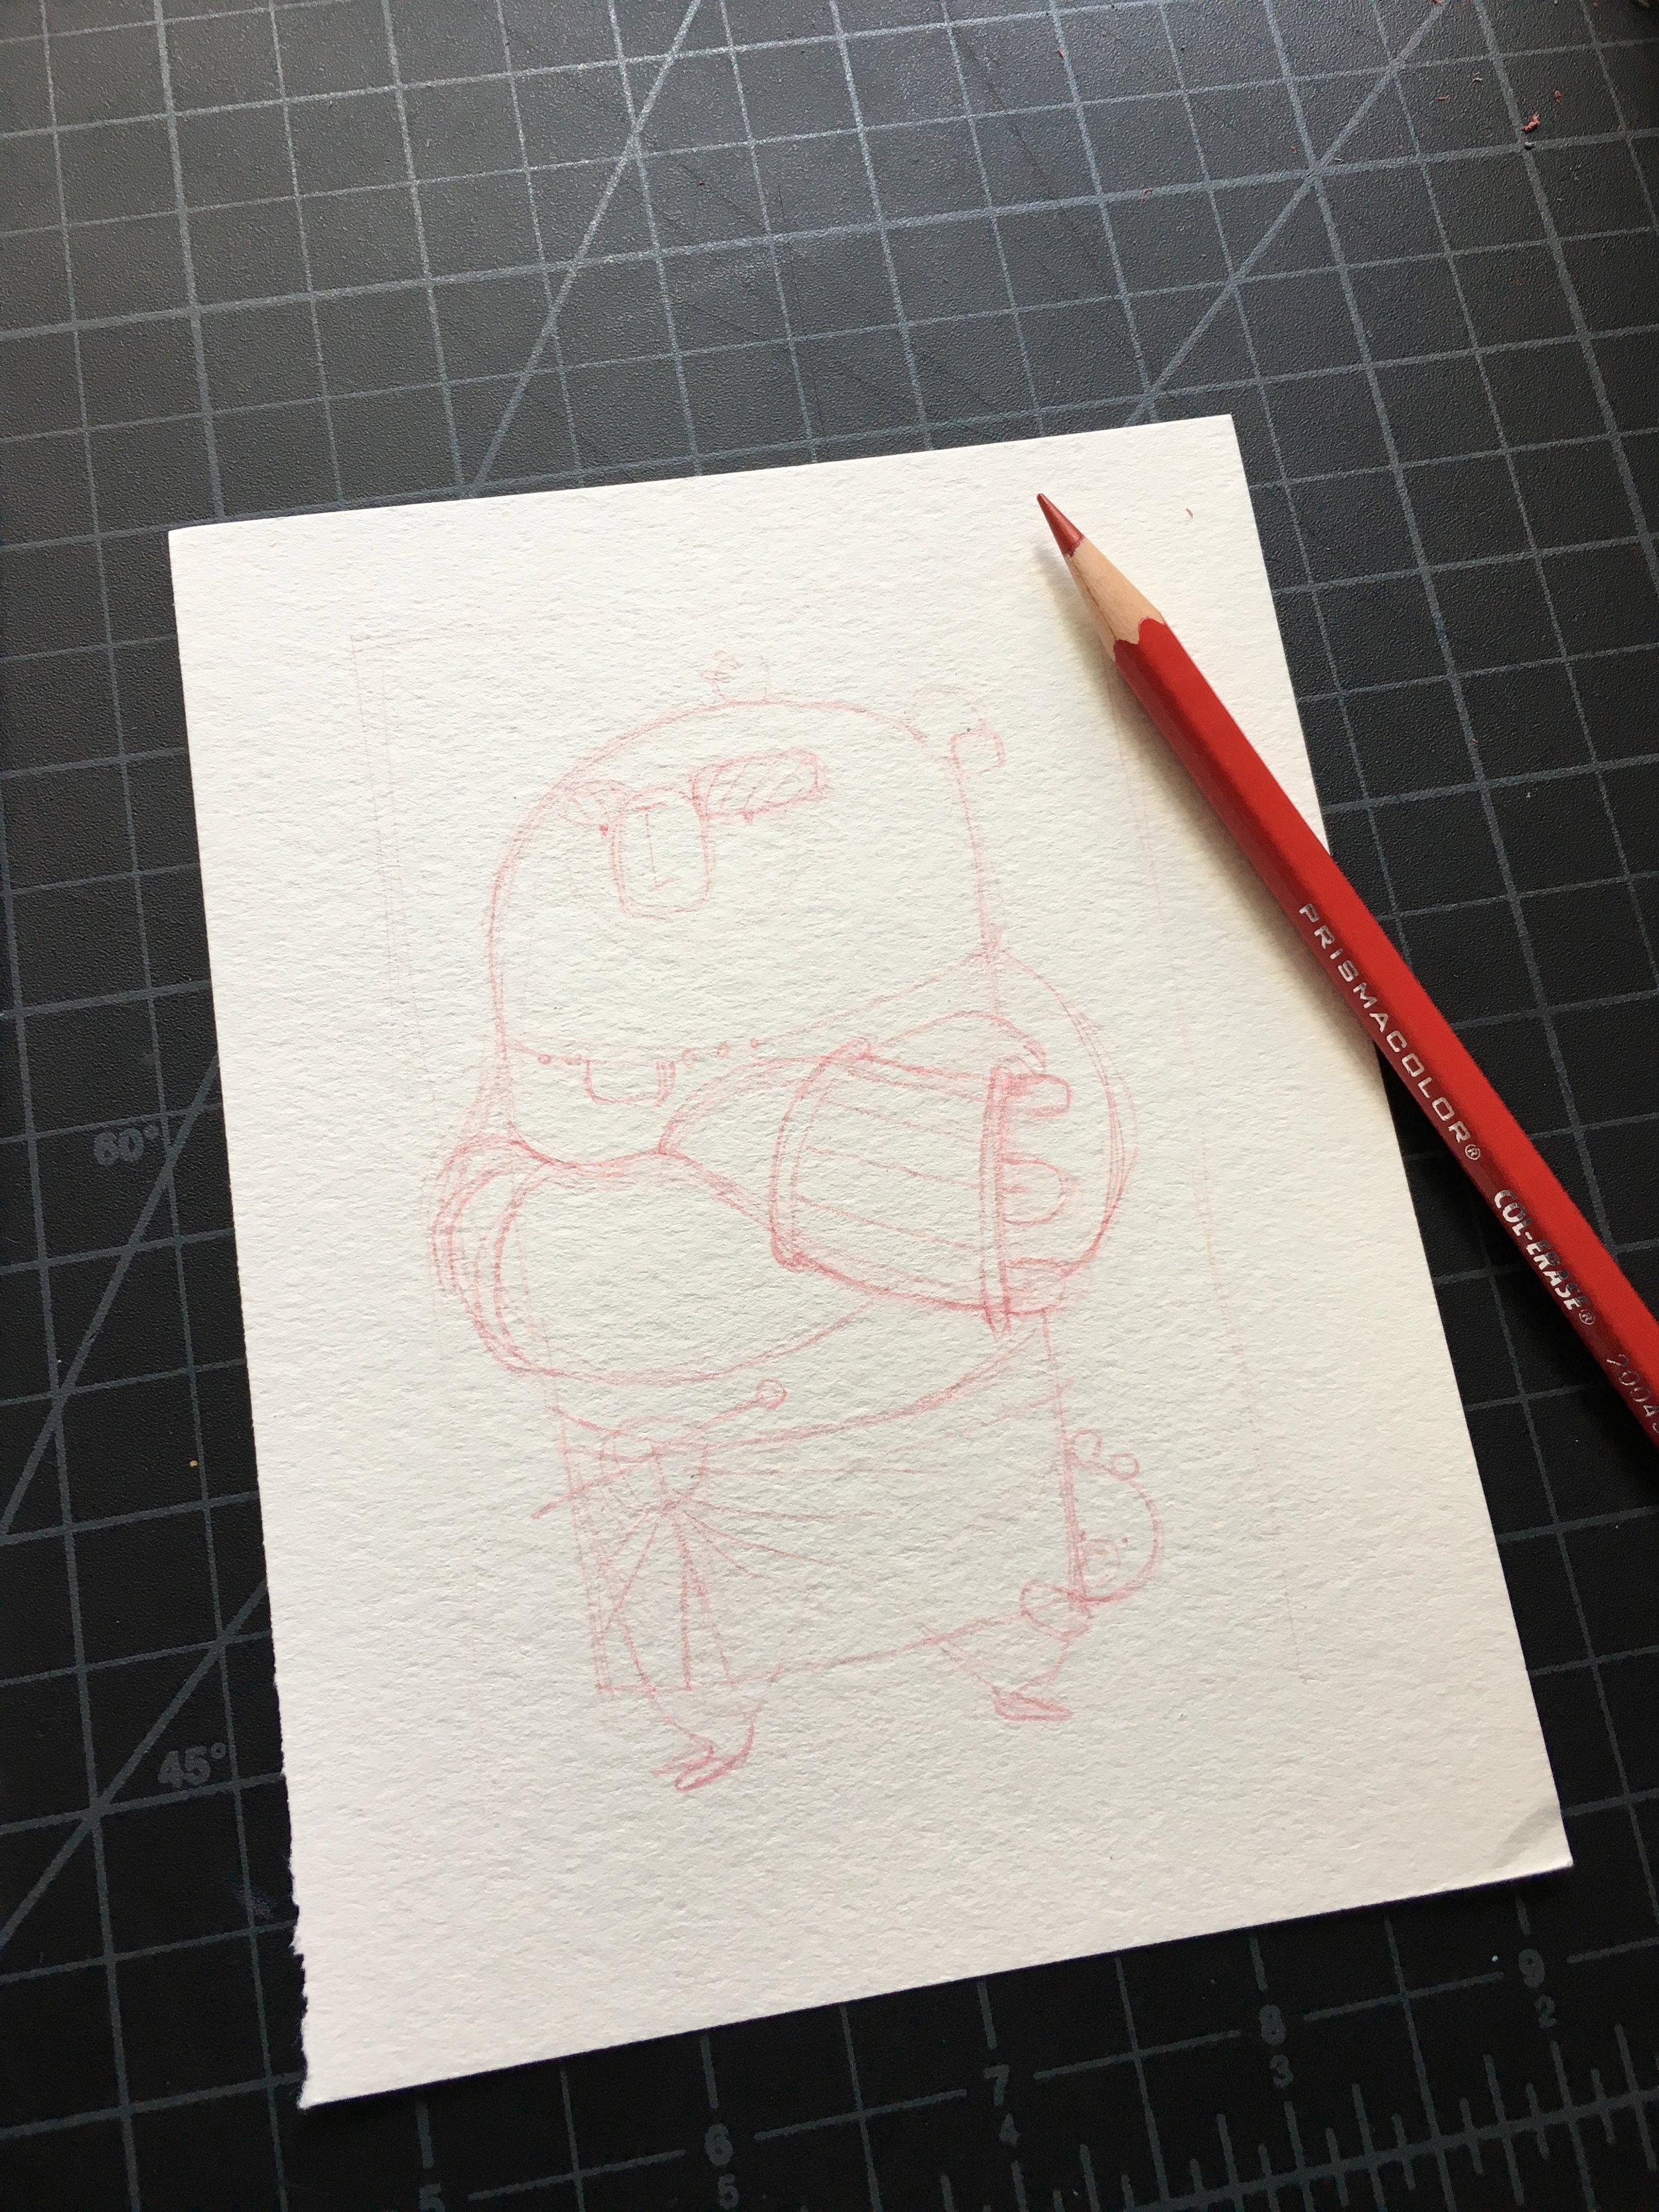 second sketch